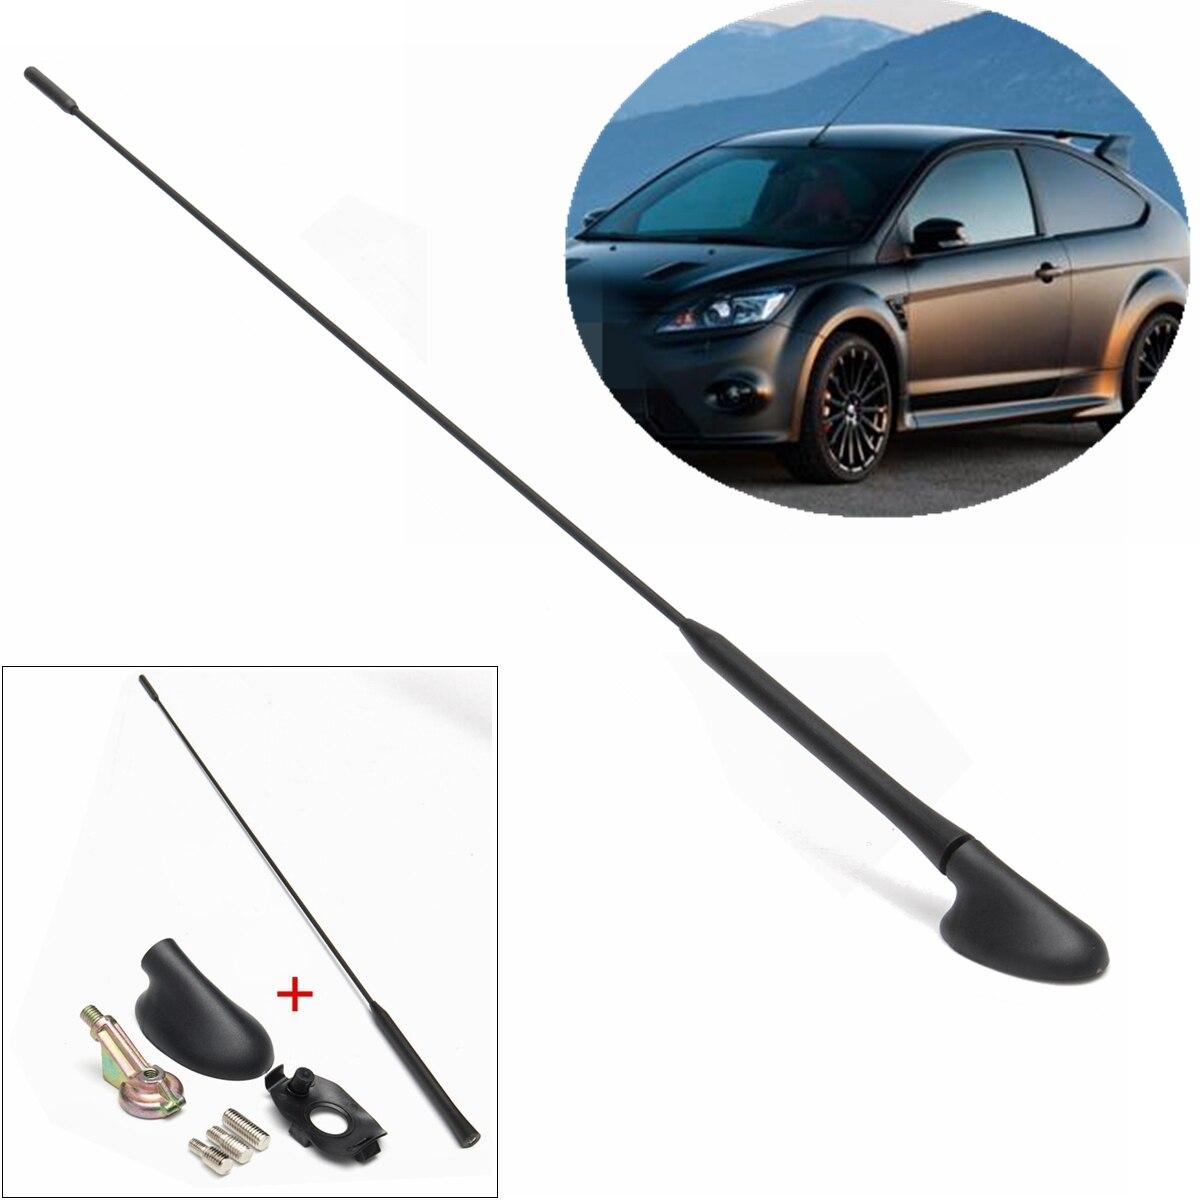 Новая автомобильная антенна на крышу AM/FM, мачта + базовый комплект для Ford, для моделей Focus 2000-2007, для моделей XS8Z18919AA